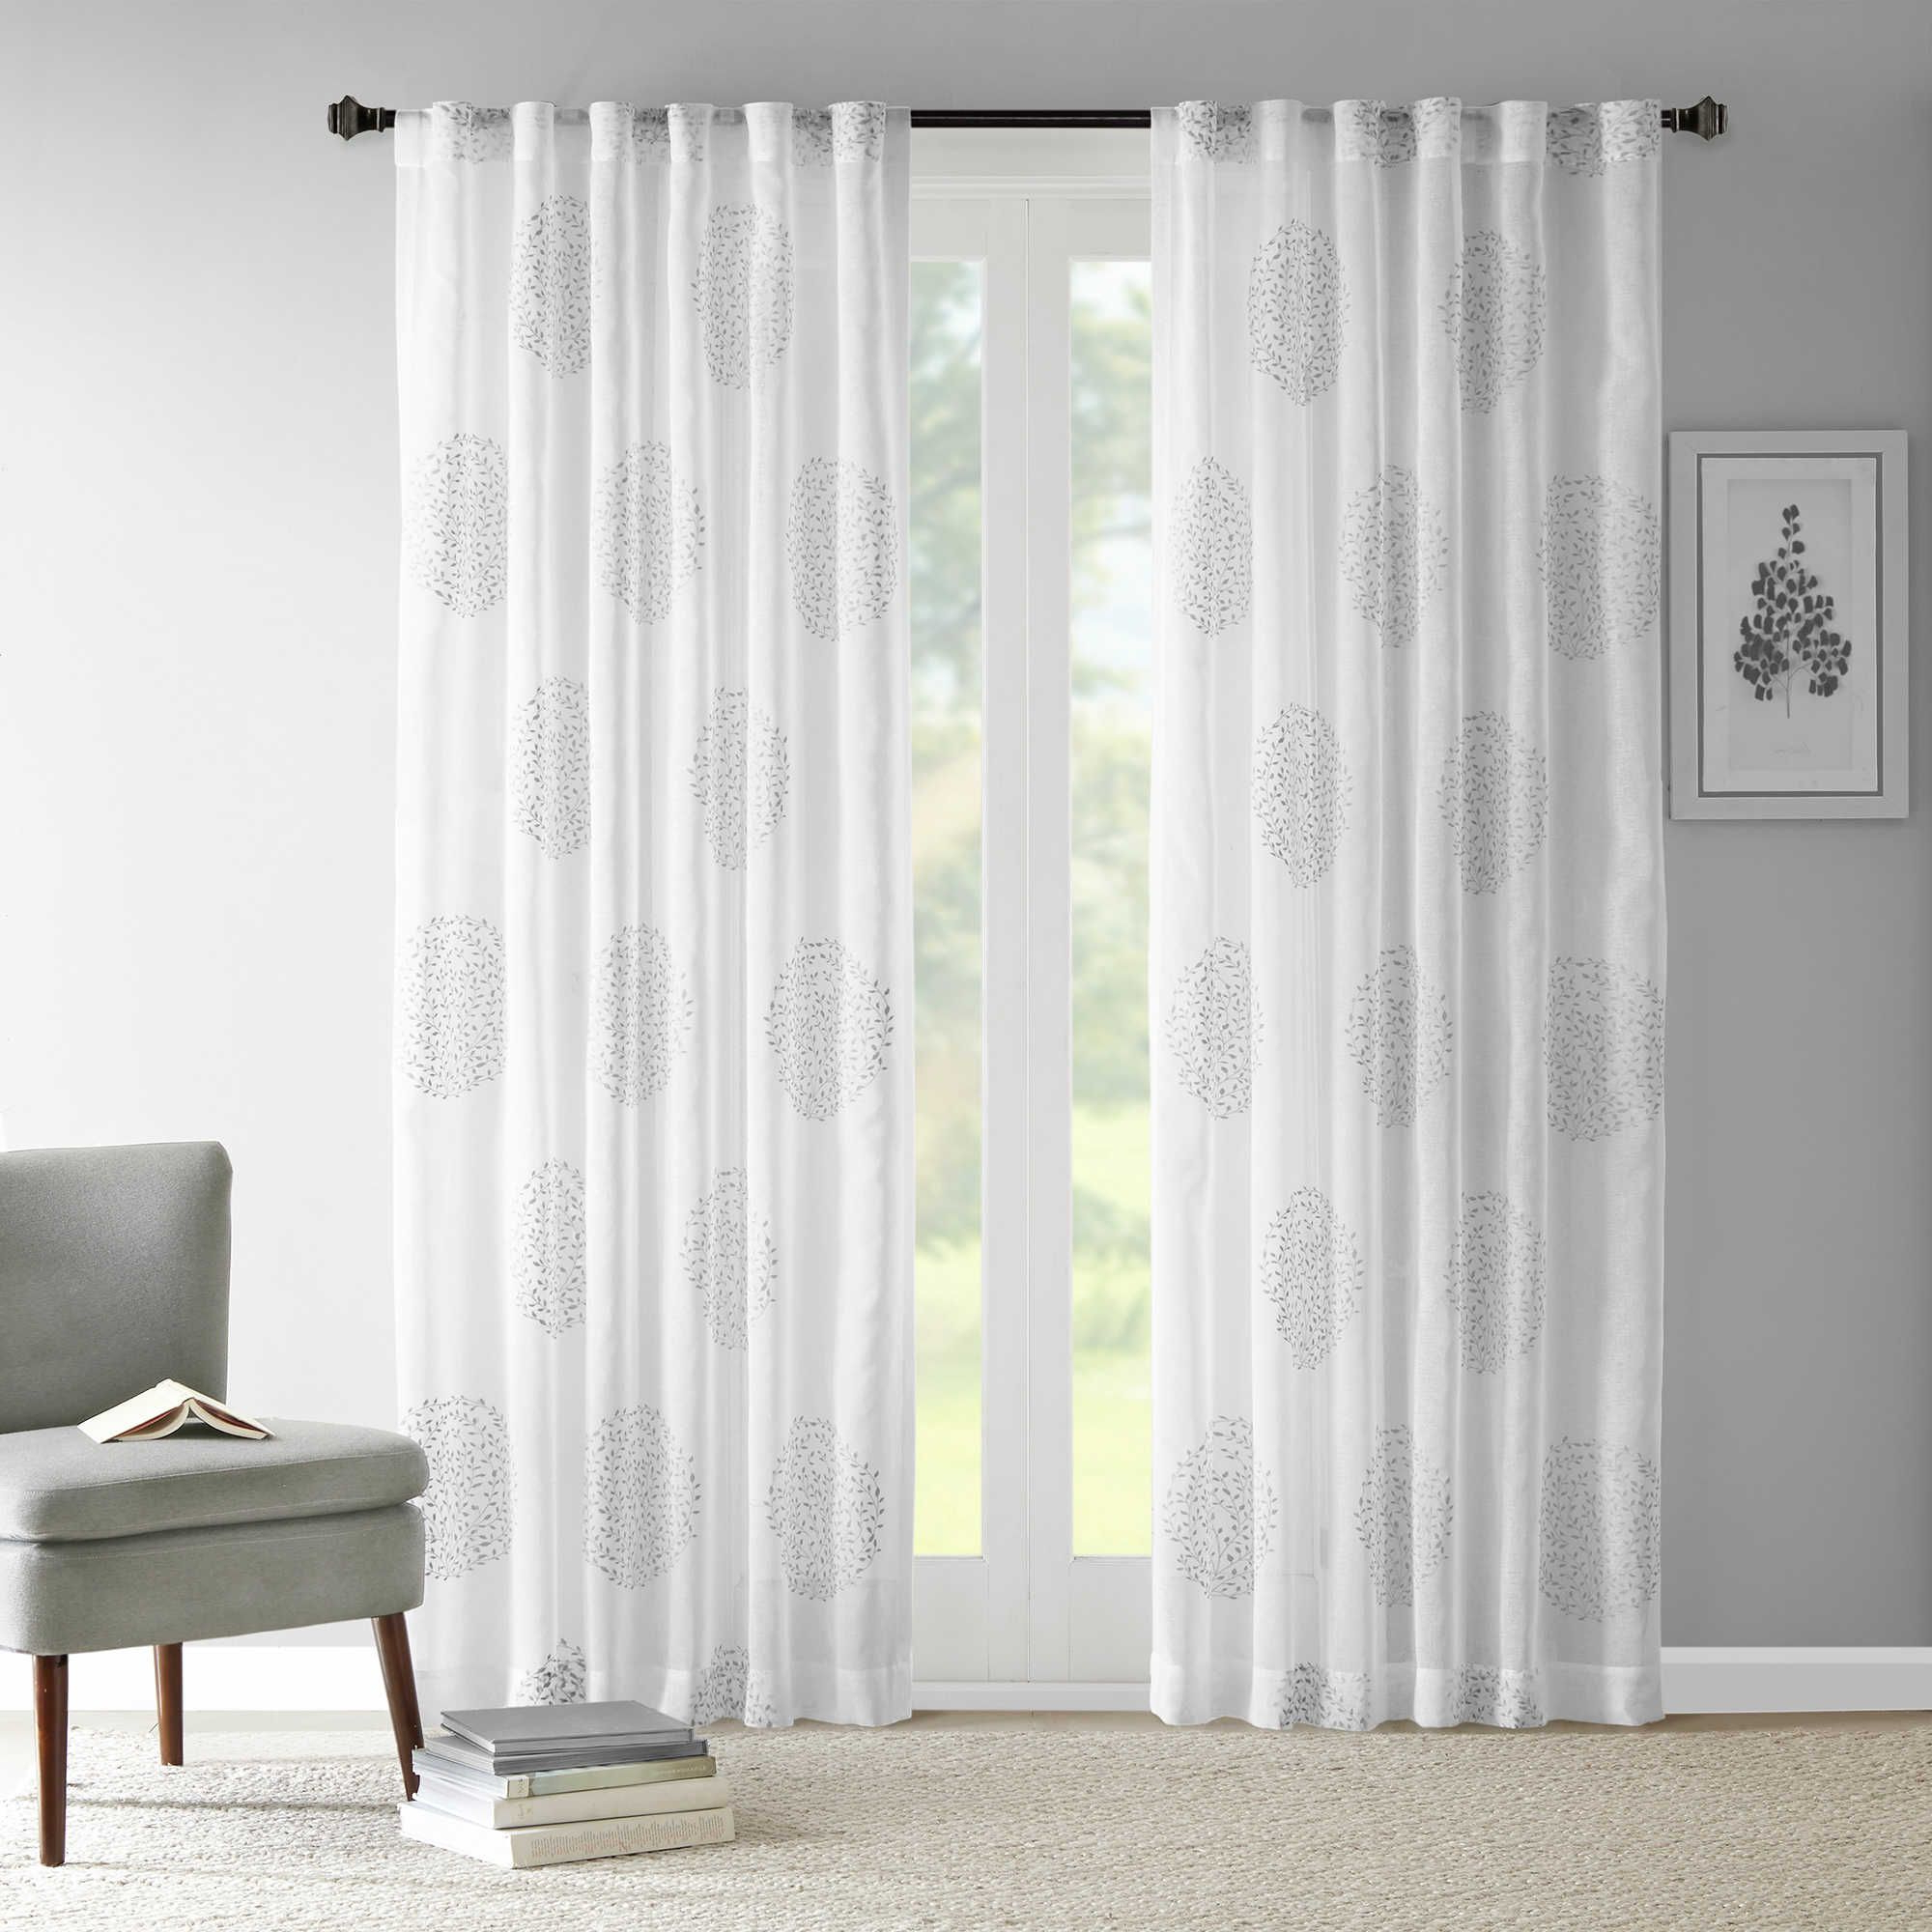 Madison Park Genia Rod Pocket/back Tab Sheer Branch Flocking Regarding Trendy Vina Sheer Bird Single Curtain Panels (View 12 of 20)